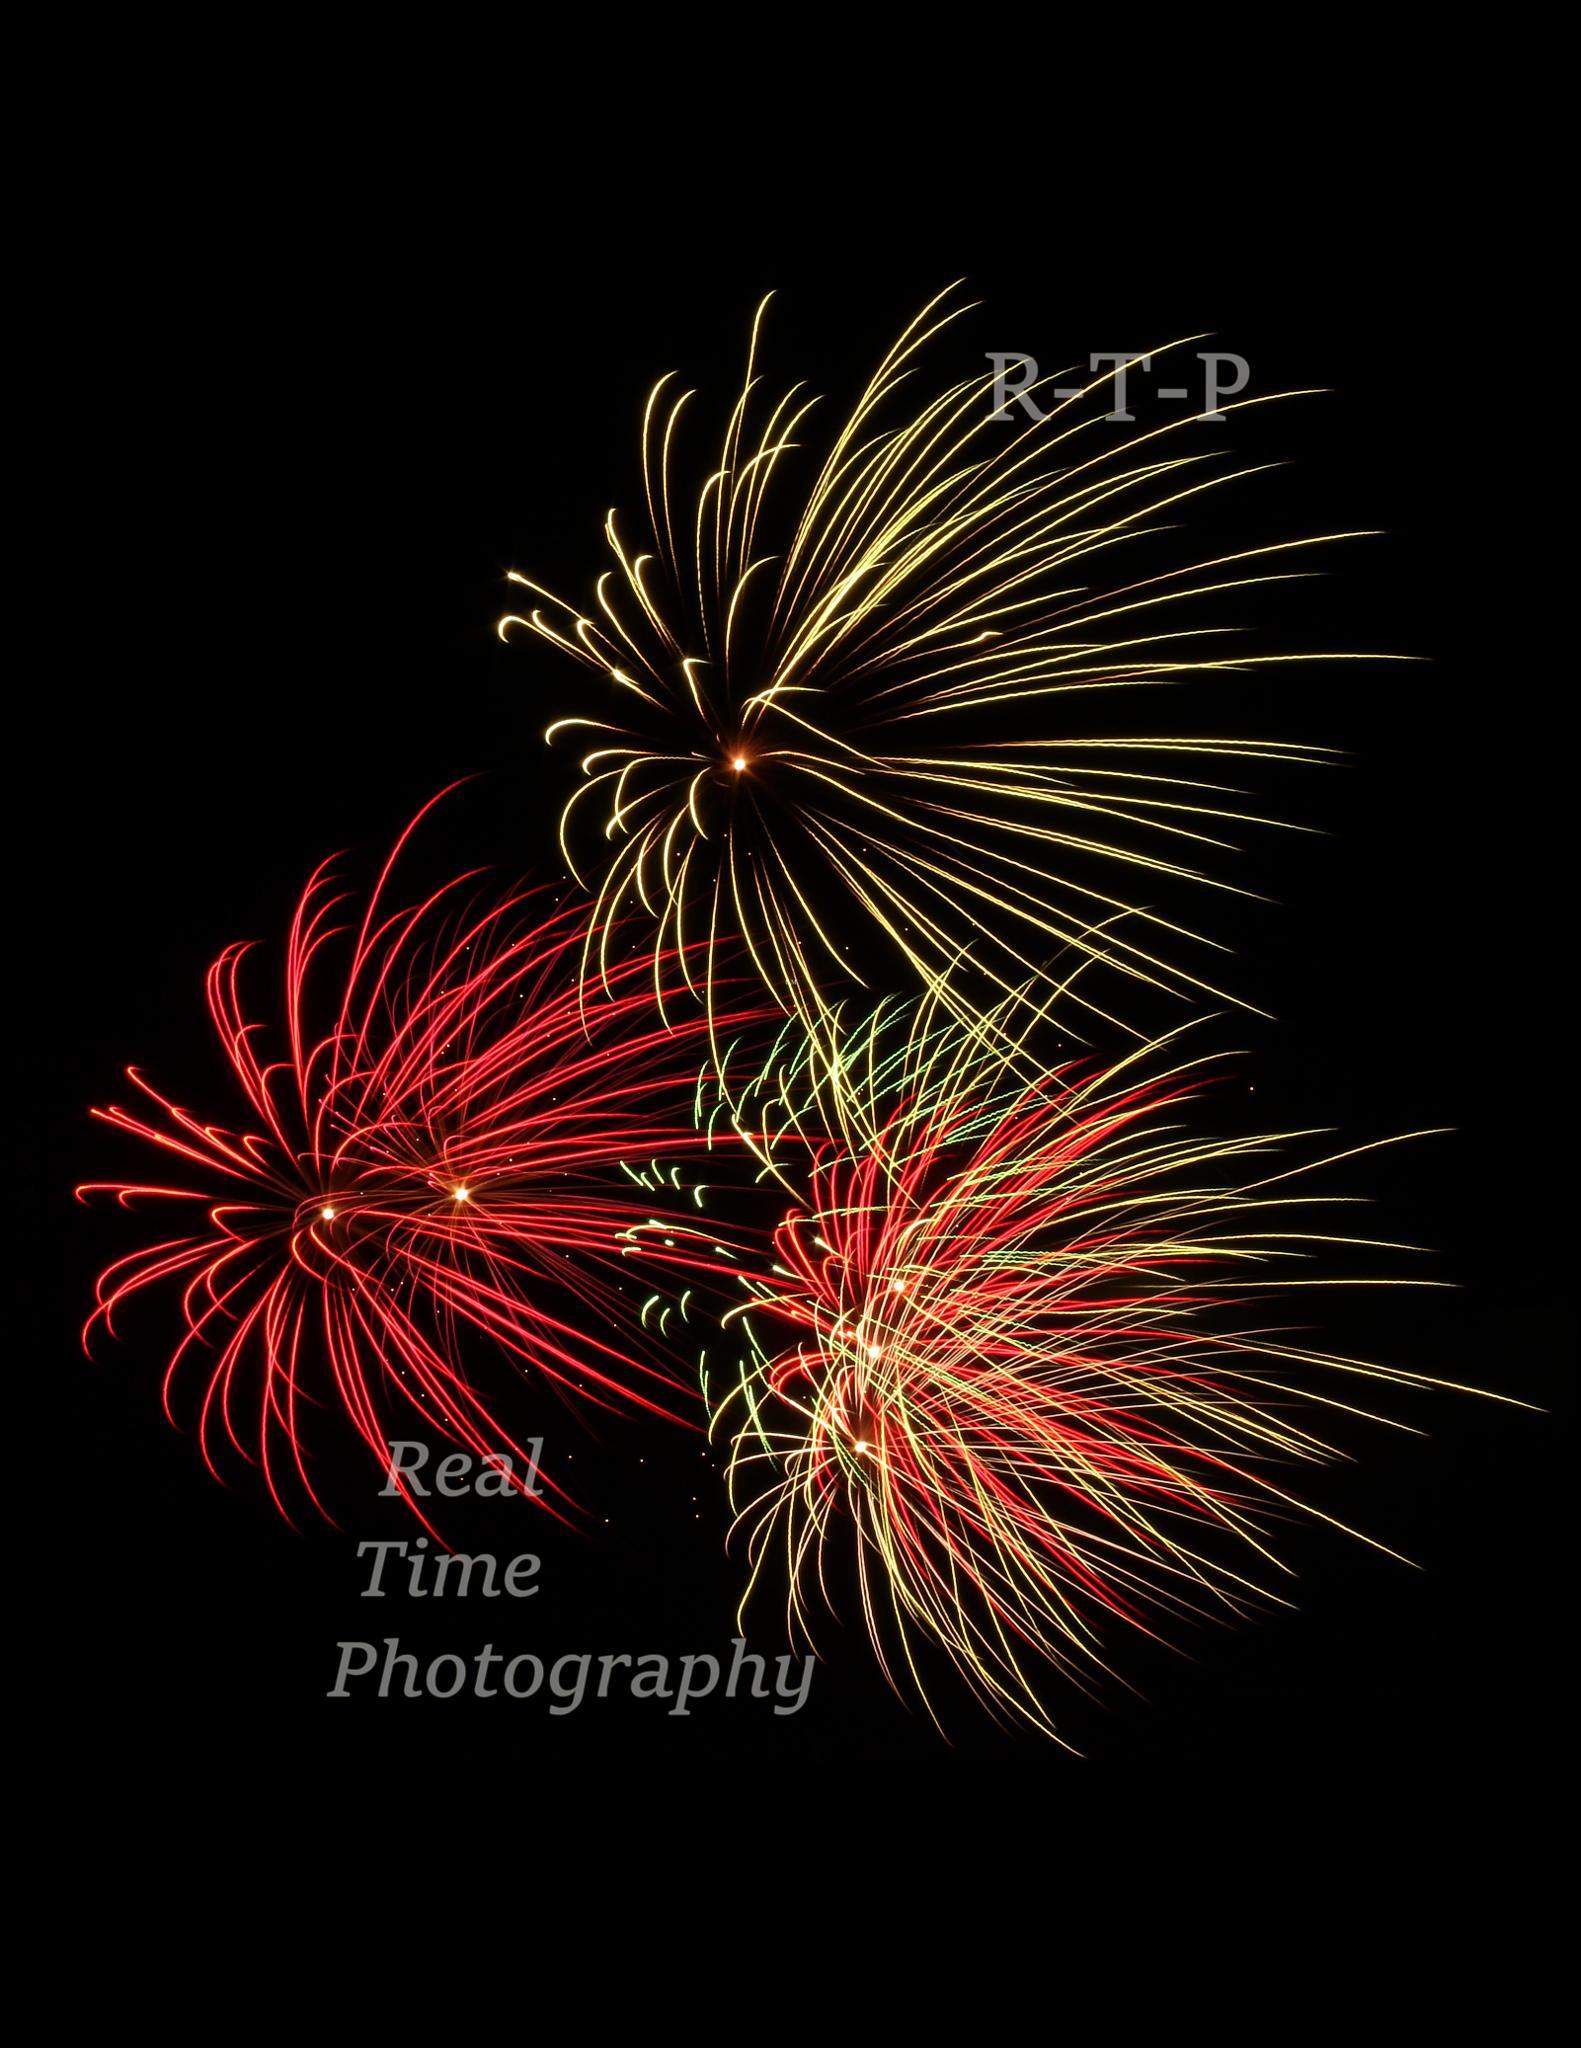 Yarmouth fireworks by Daryl Marlow